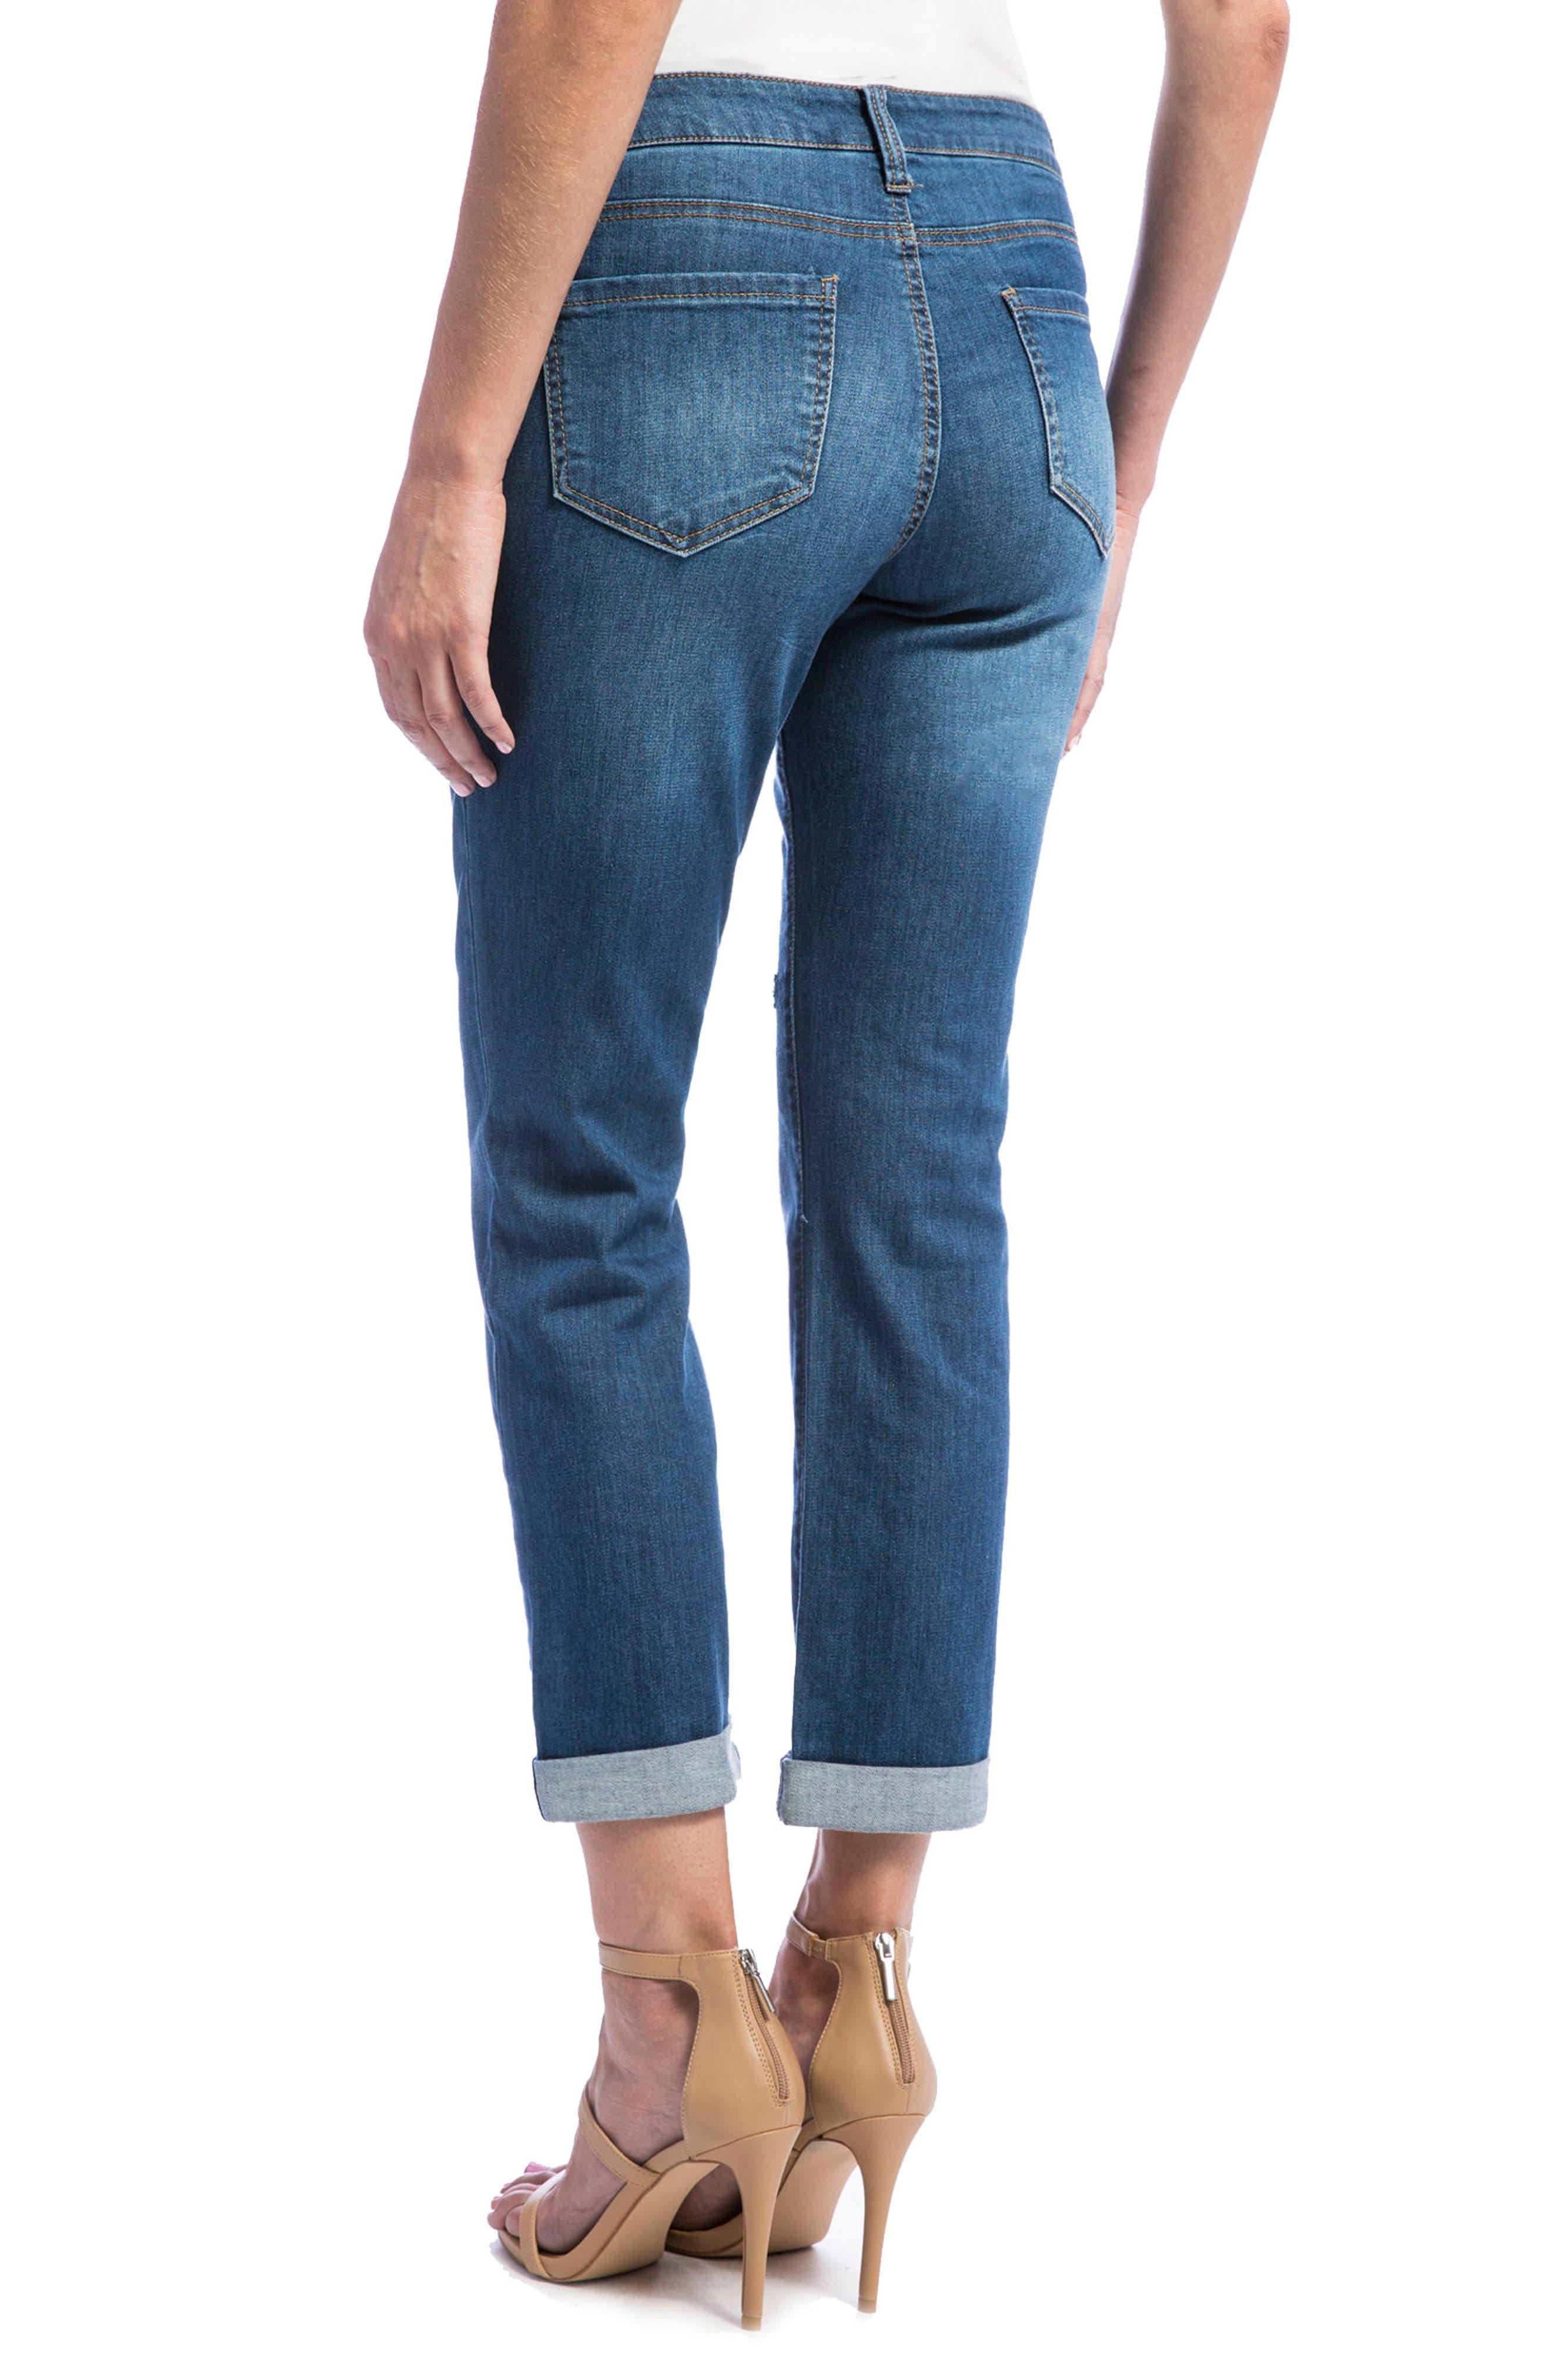 Jeans Company Peyton Slim Stretch Crop Boyfriend Jeans,                             Alternate thumbnail 2, color,                             401